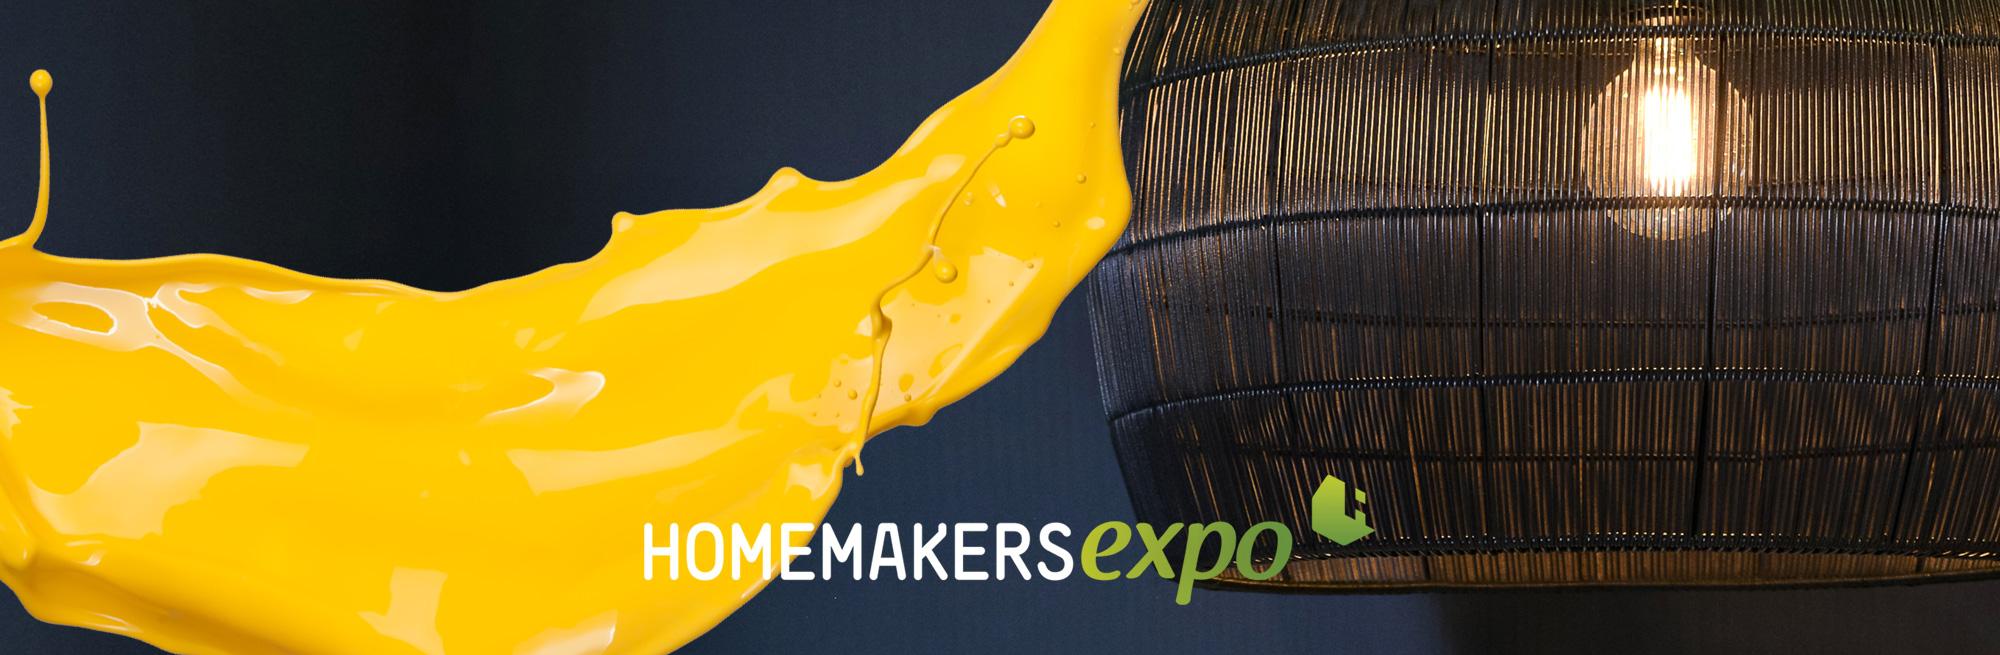 2018 HOMEMAKERS Expo